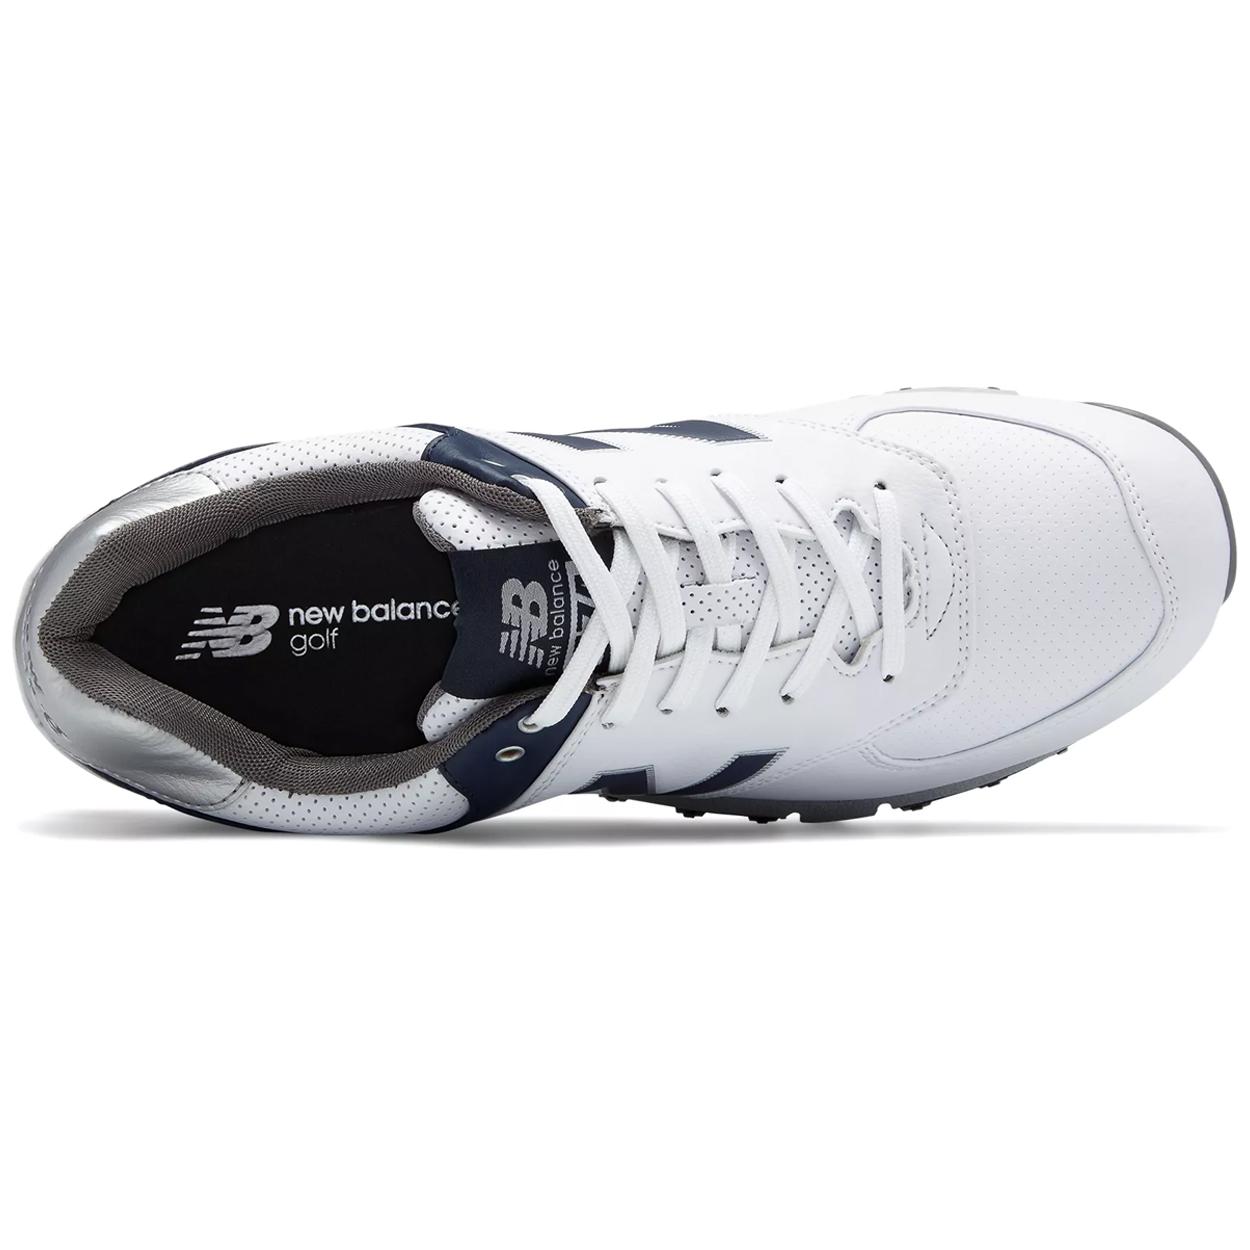 New-Balance-NBG574SL-Men-039-s-Spikeless-Microfiber-Leather-Golf-Shoe-New thumbnail 12